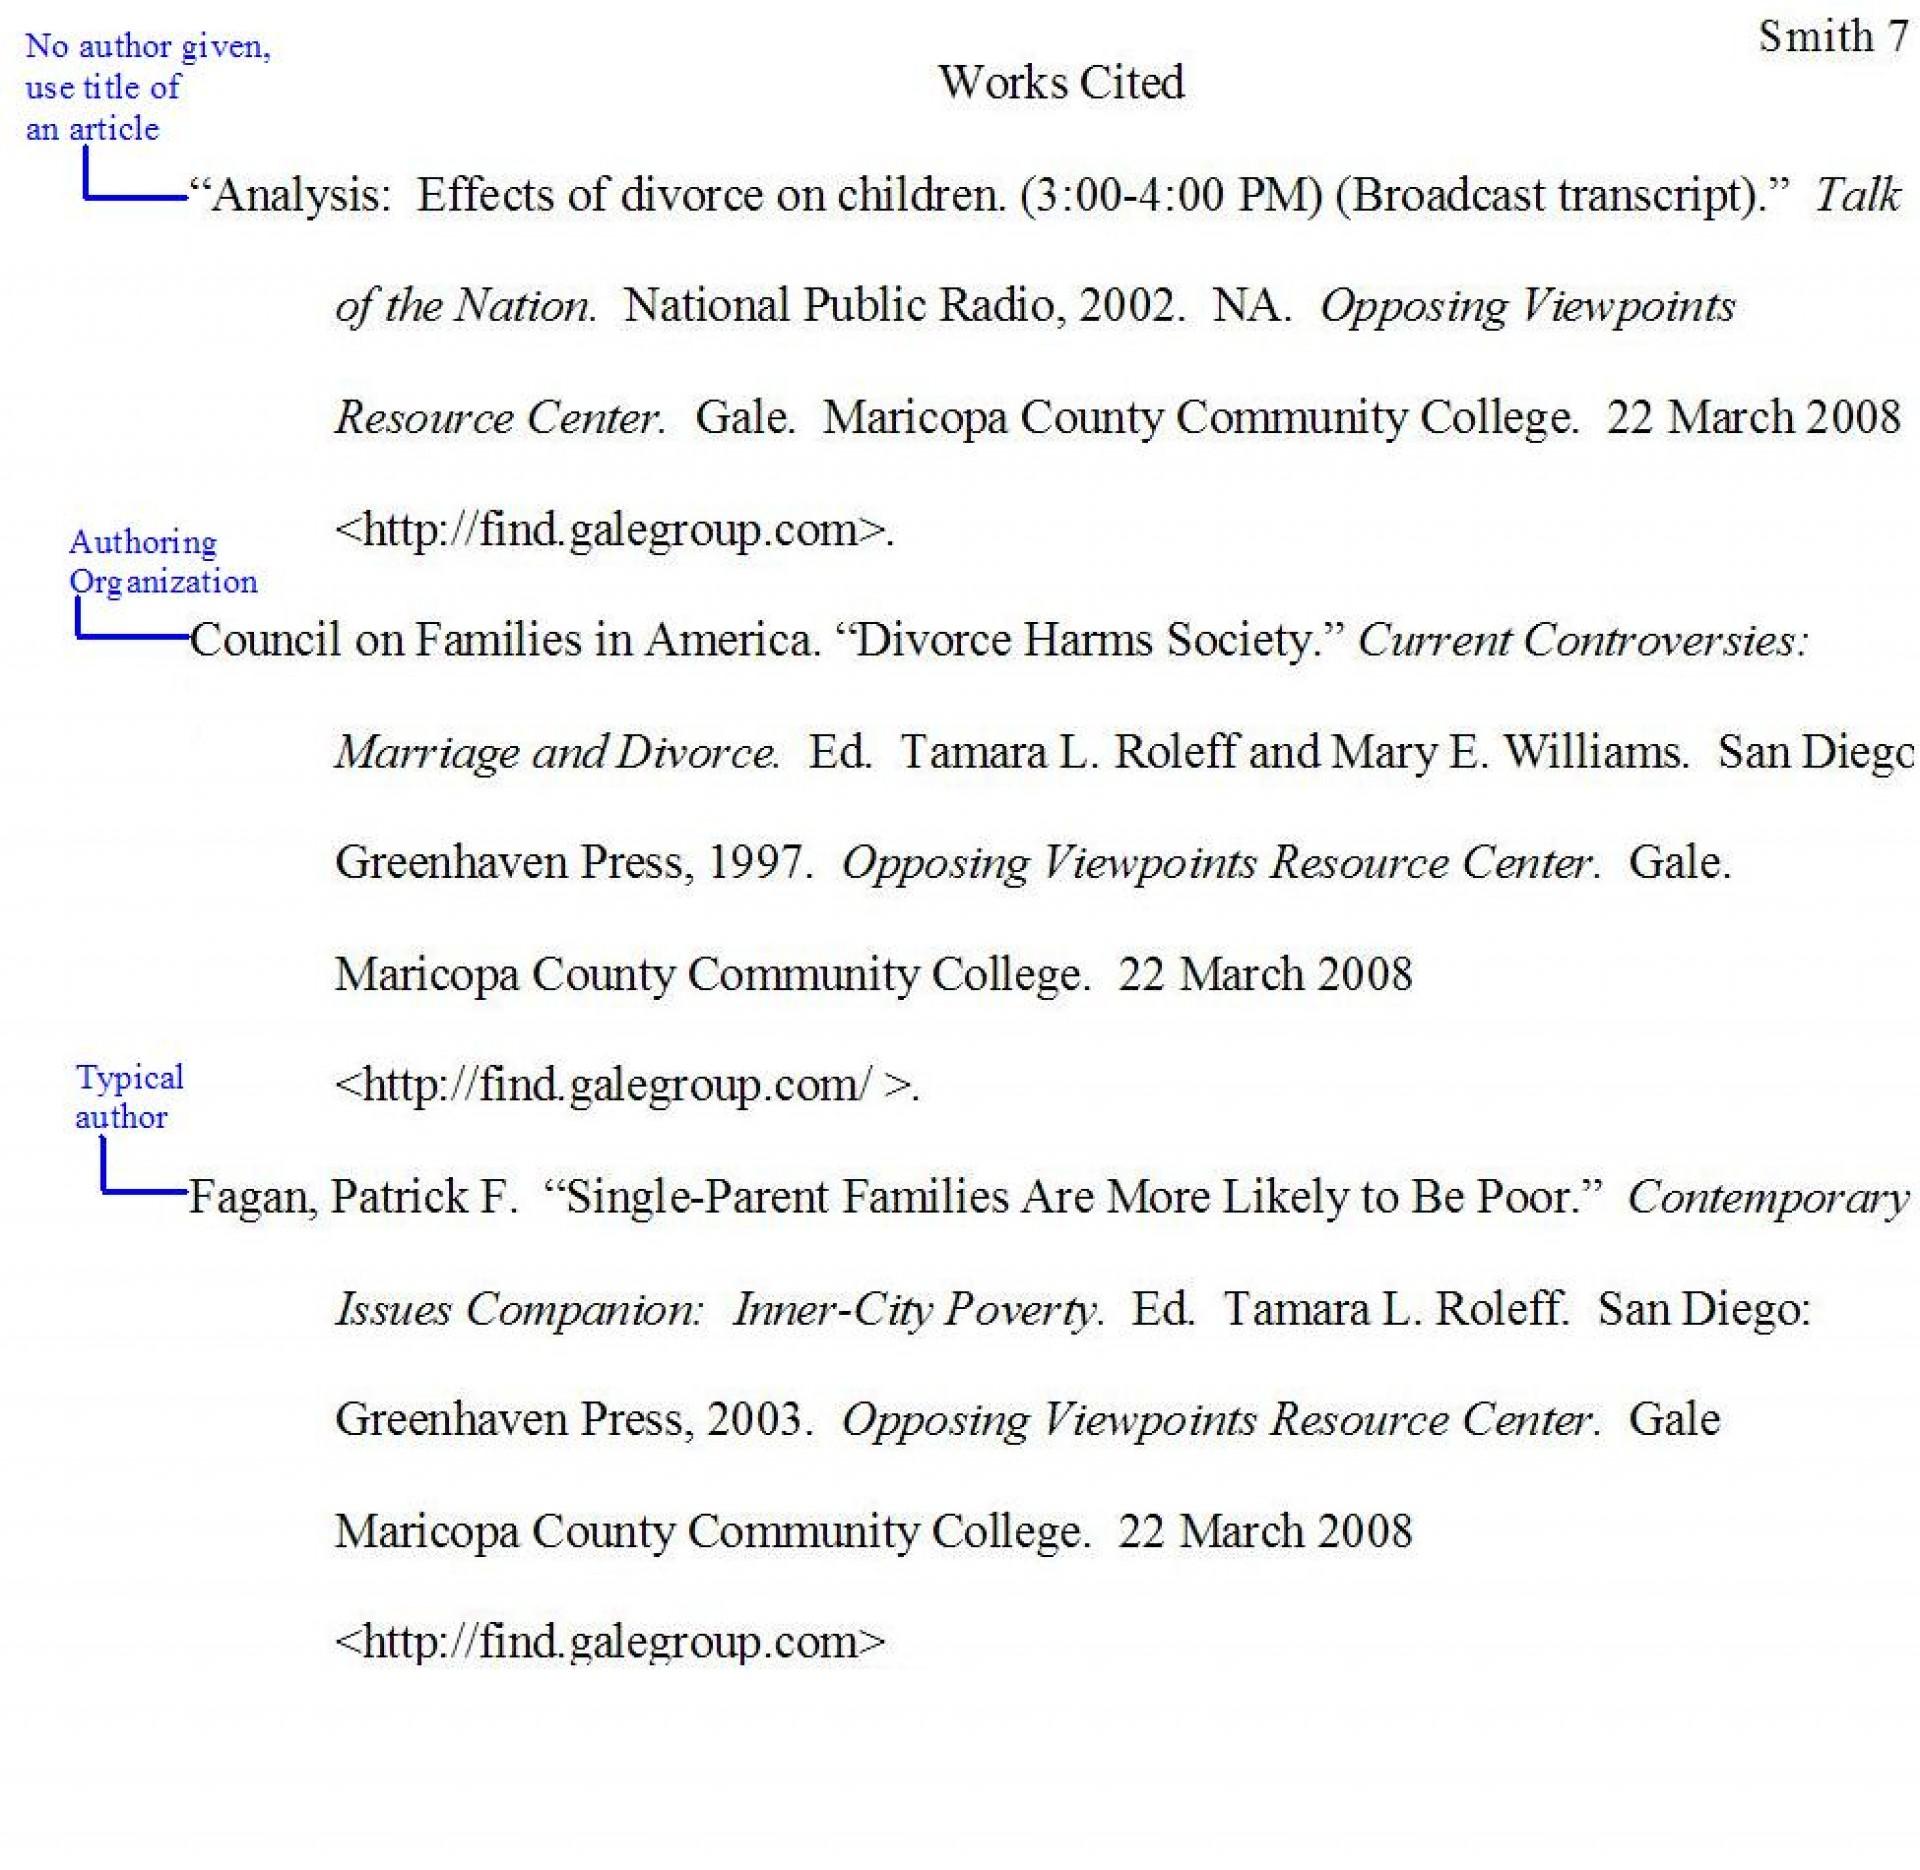 016 Paragraph Essay Sample Samplewrkctd Jpg Stirring 5 Free Outline Template Printable Argumentative 1920